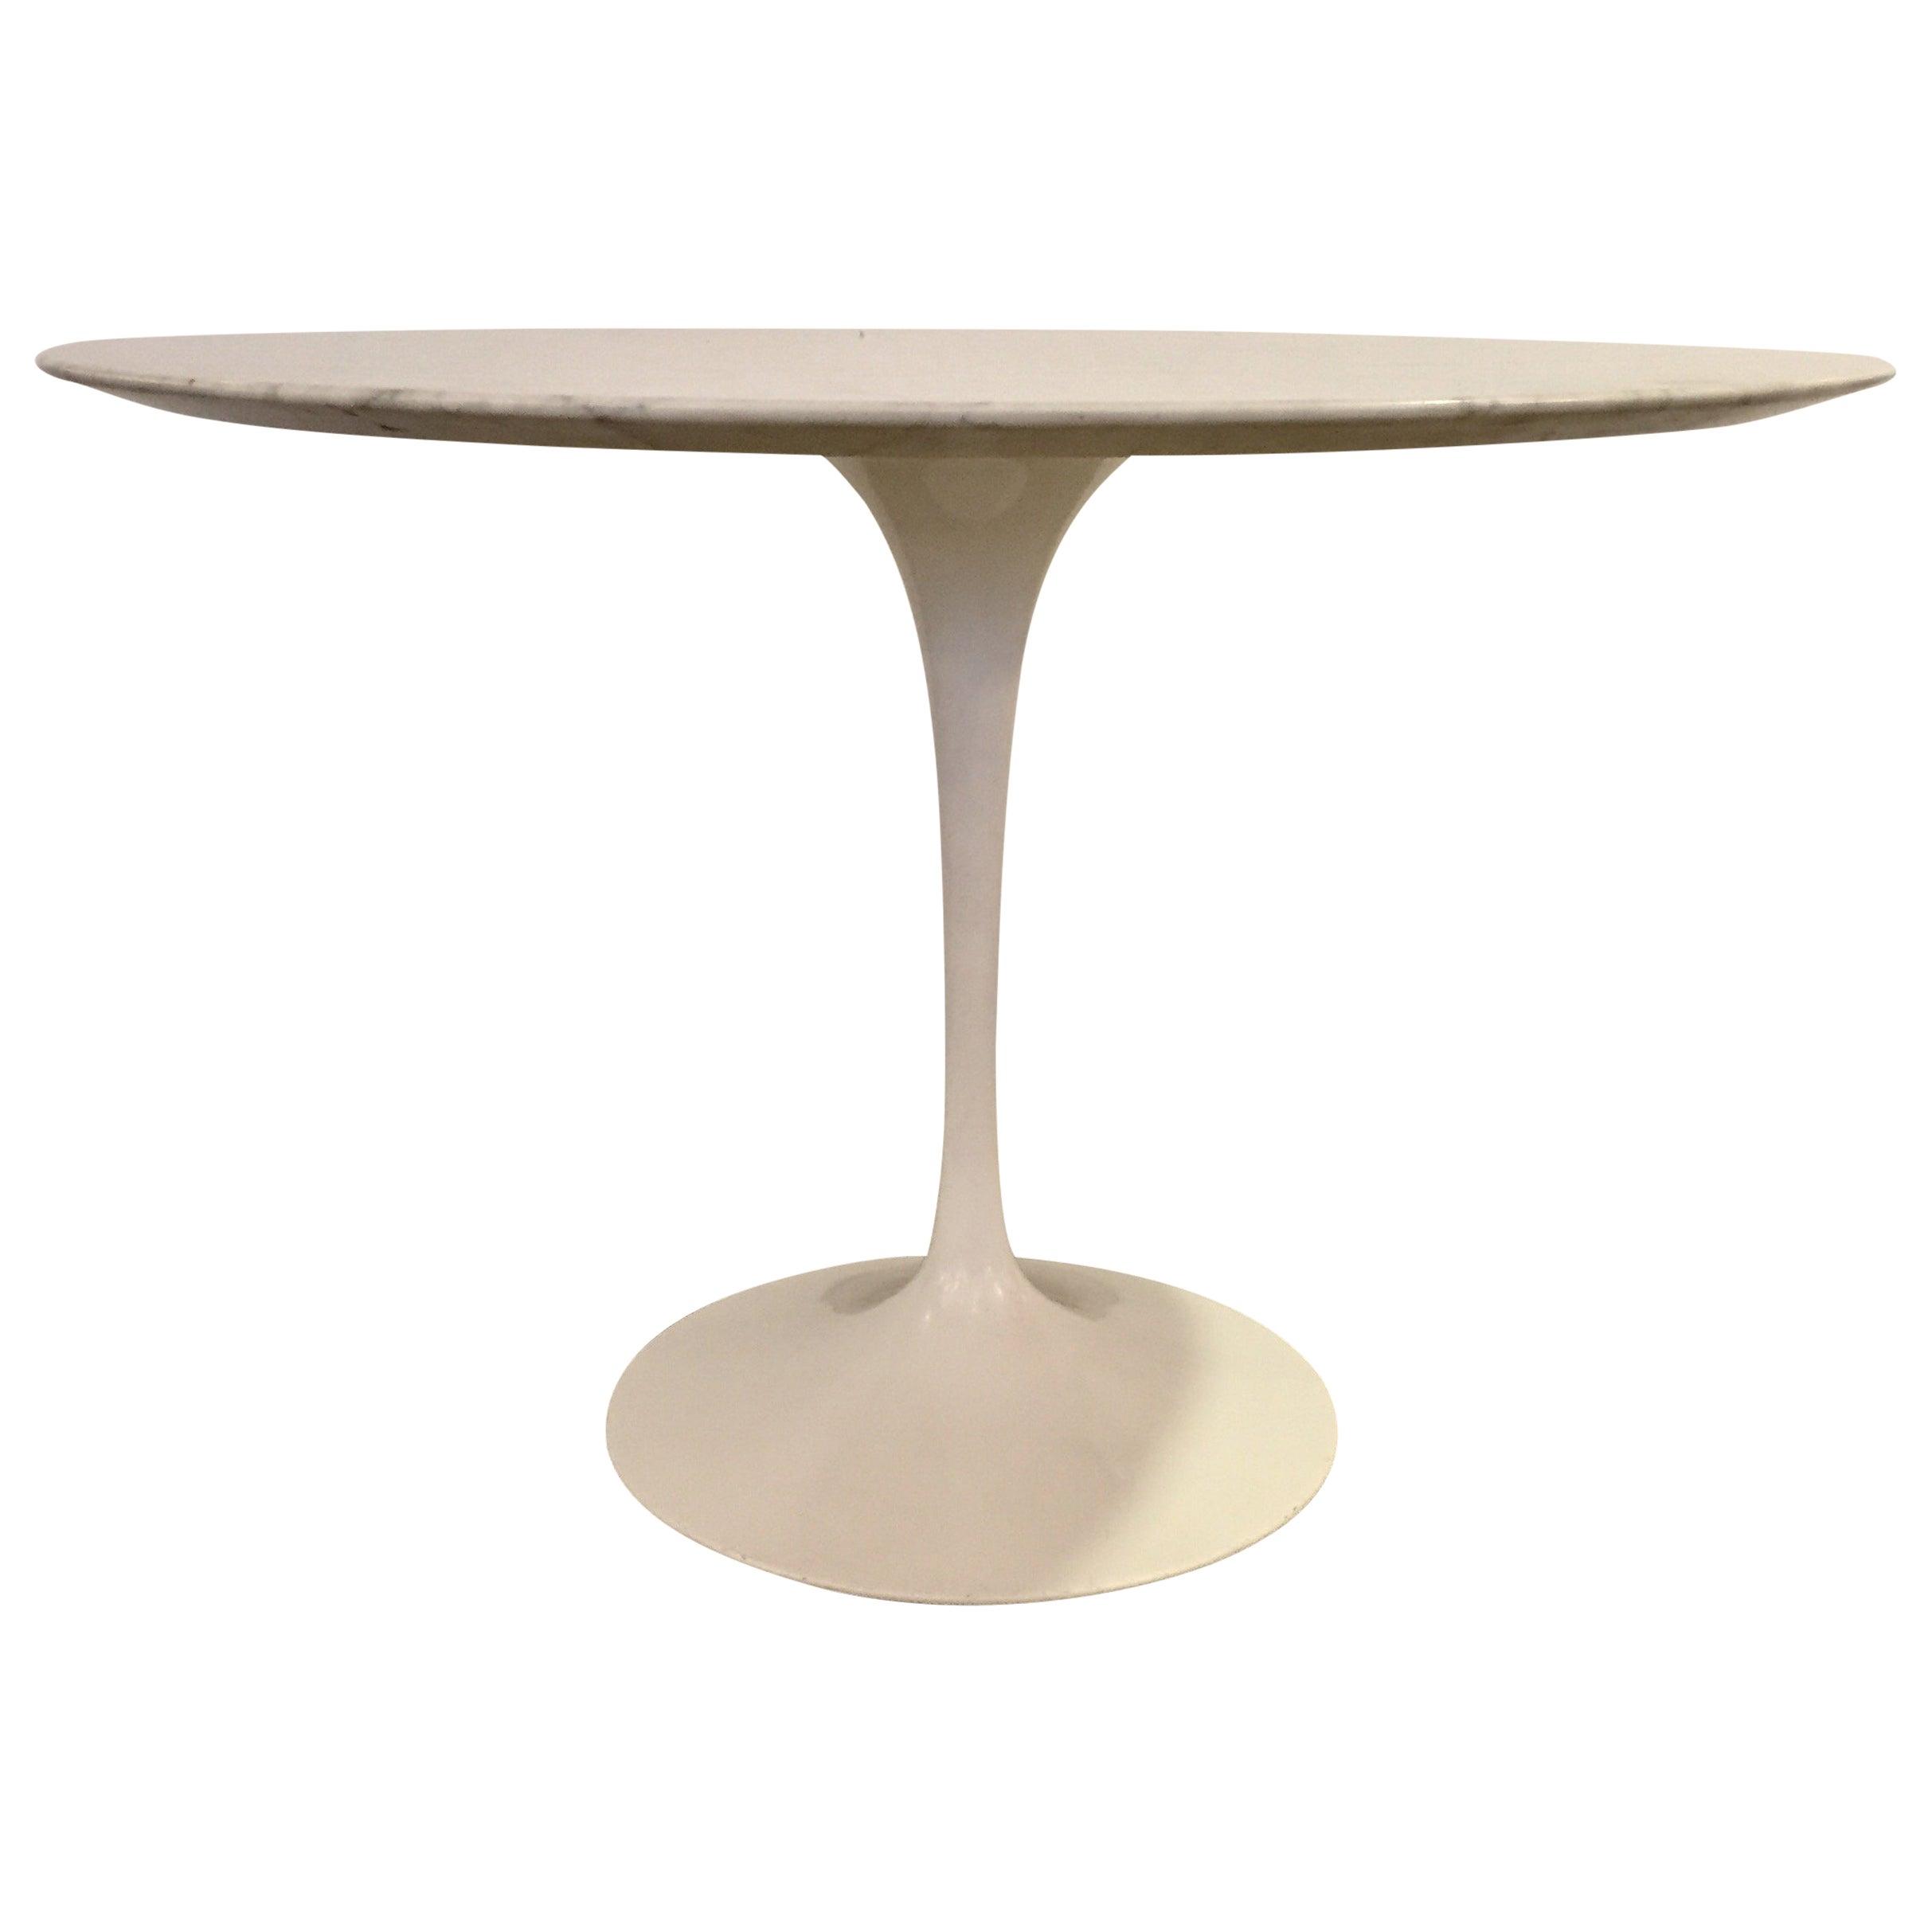 Tulip Table by Eero Saarinen